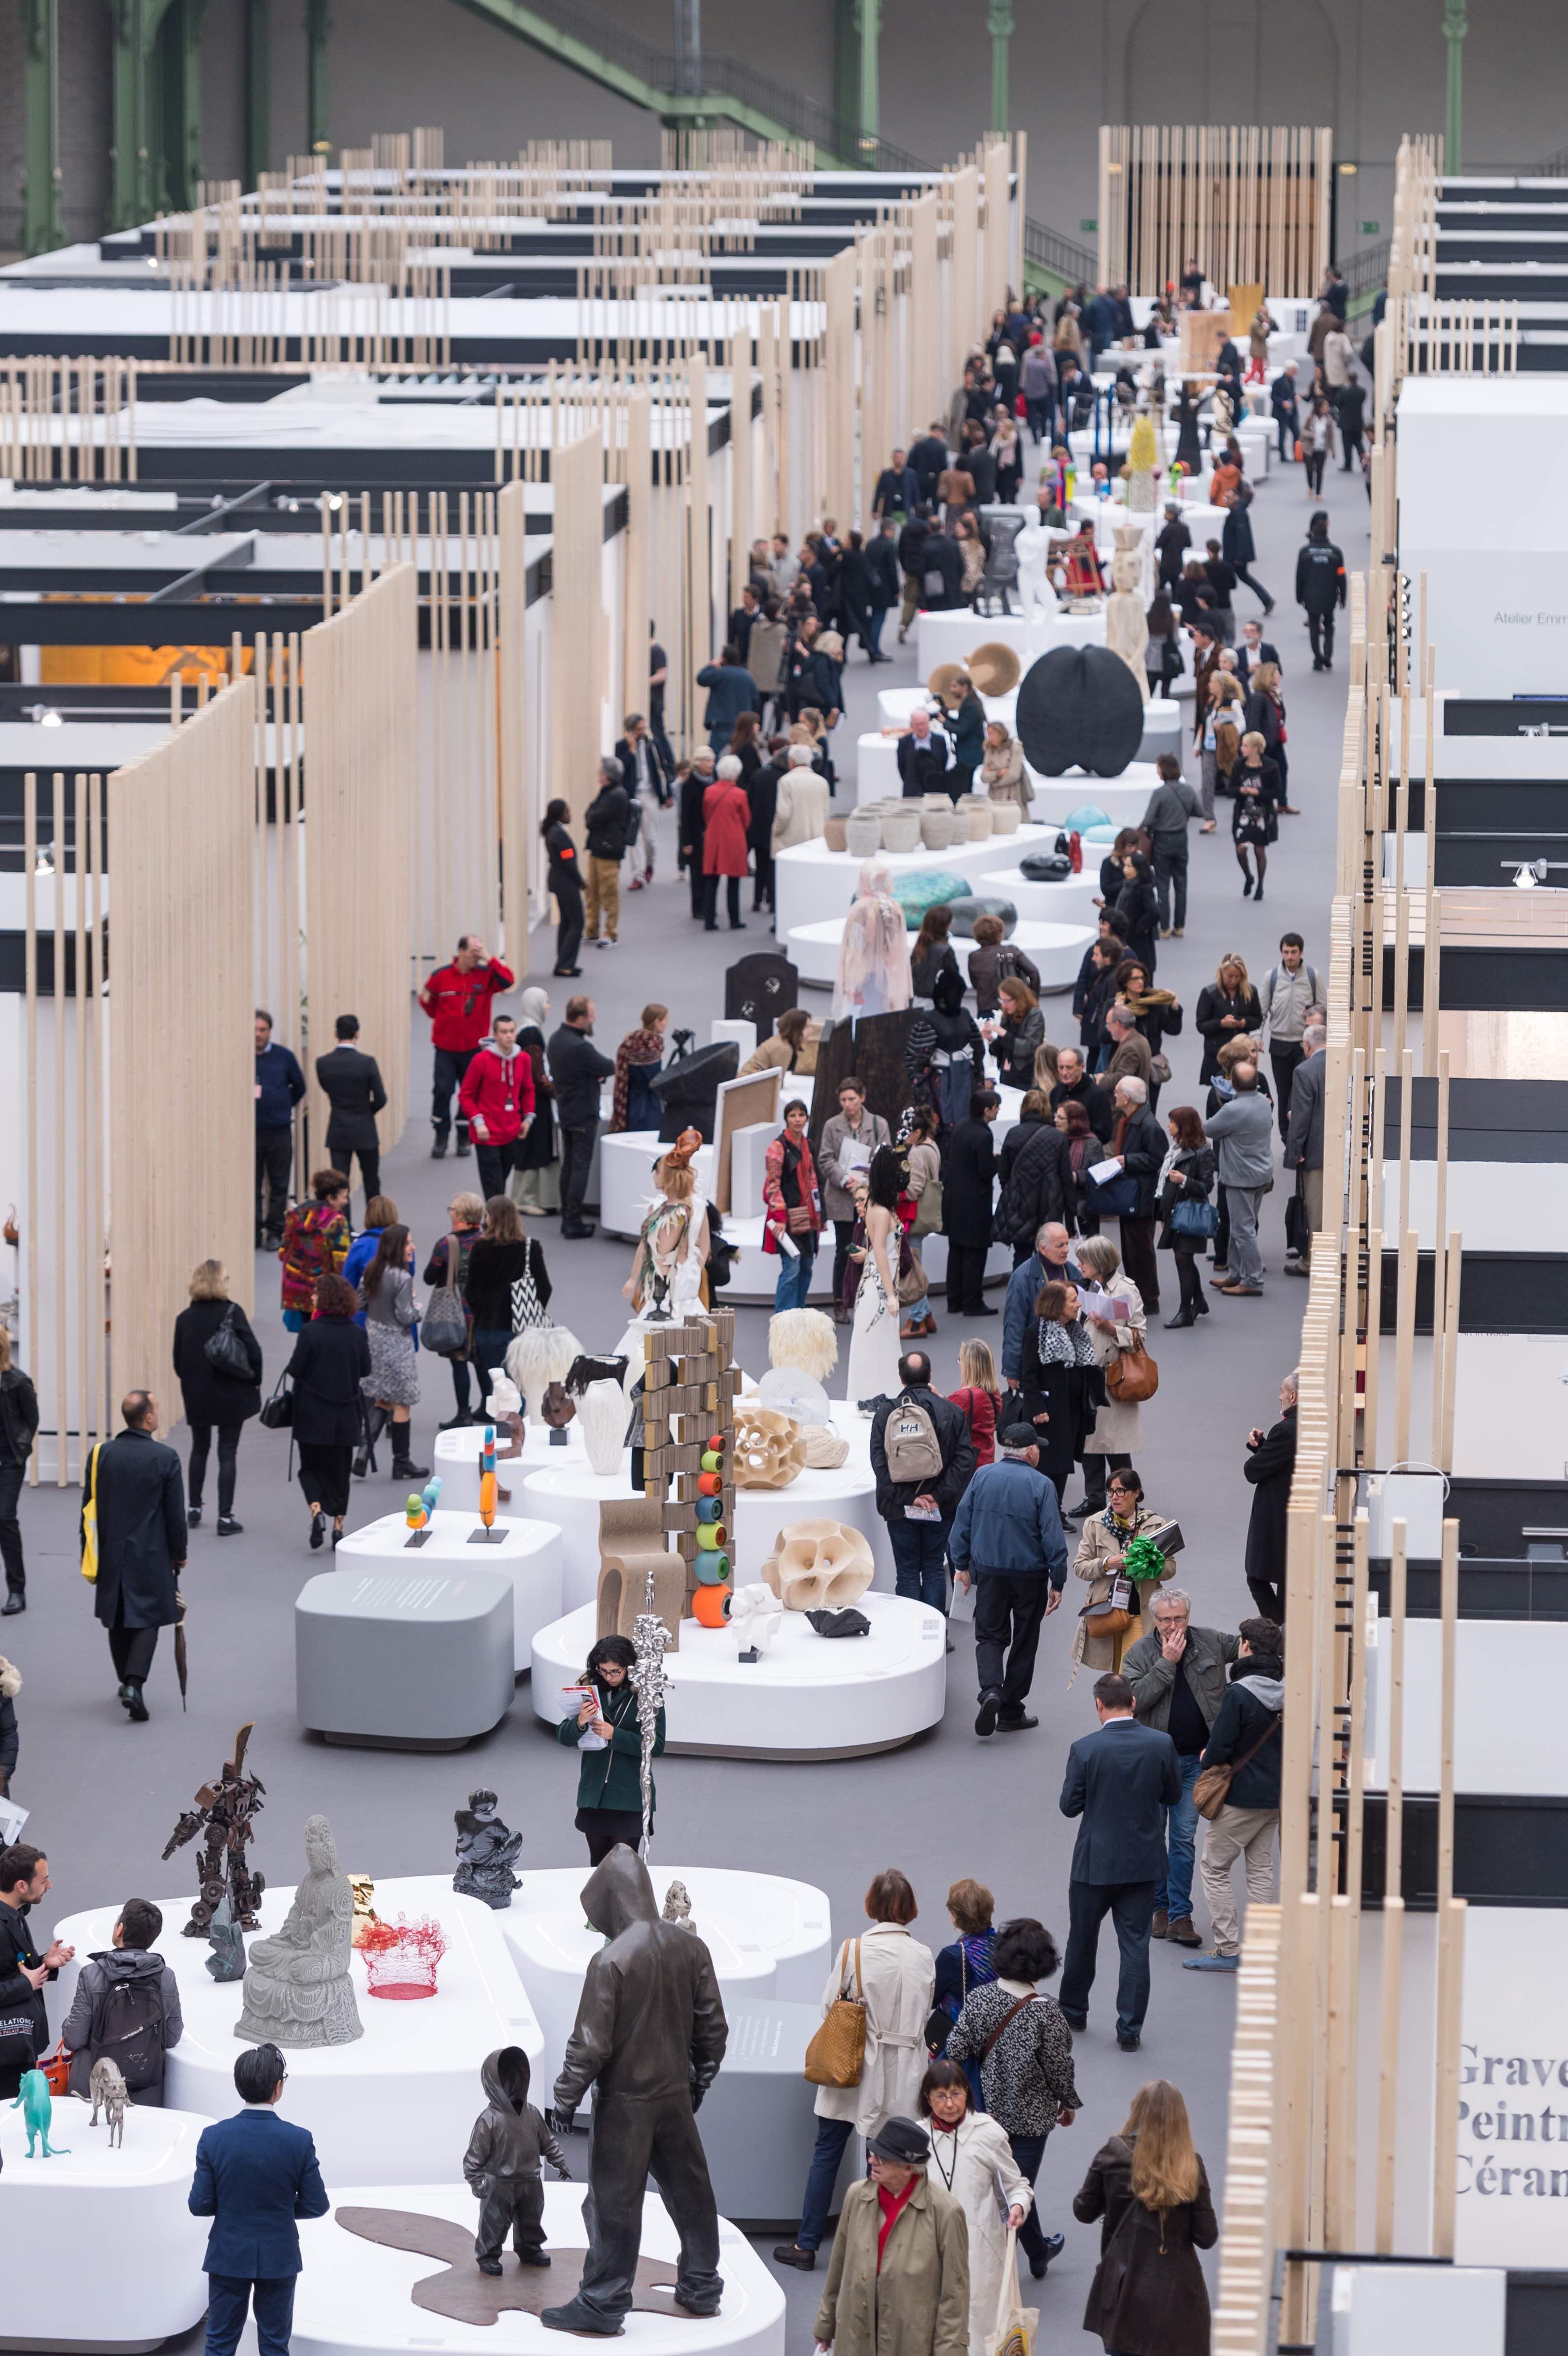 Exposition « Le Banquet », image © PHOTOPROEVENT